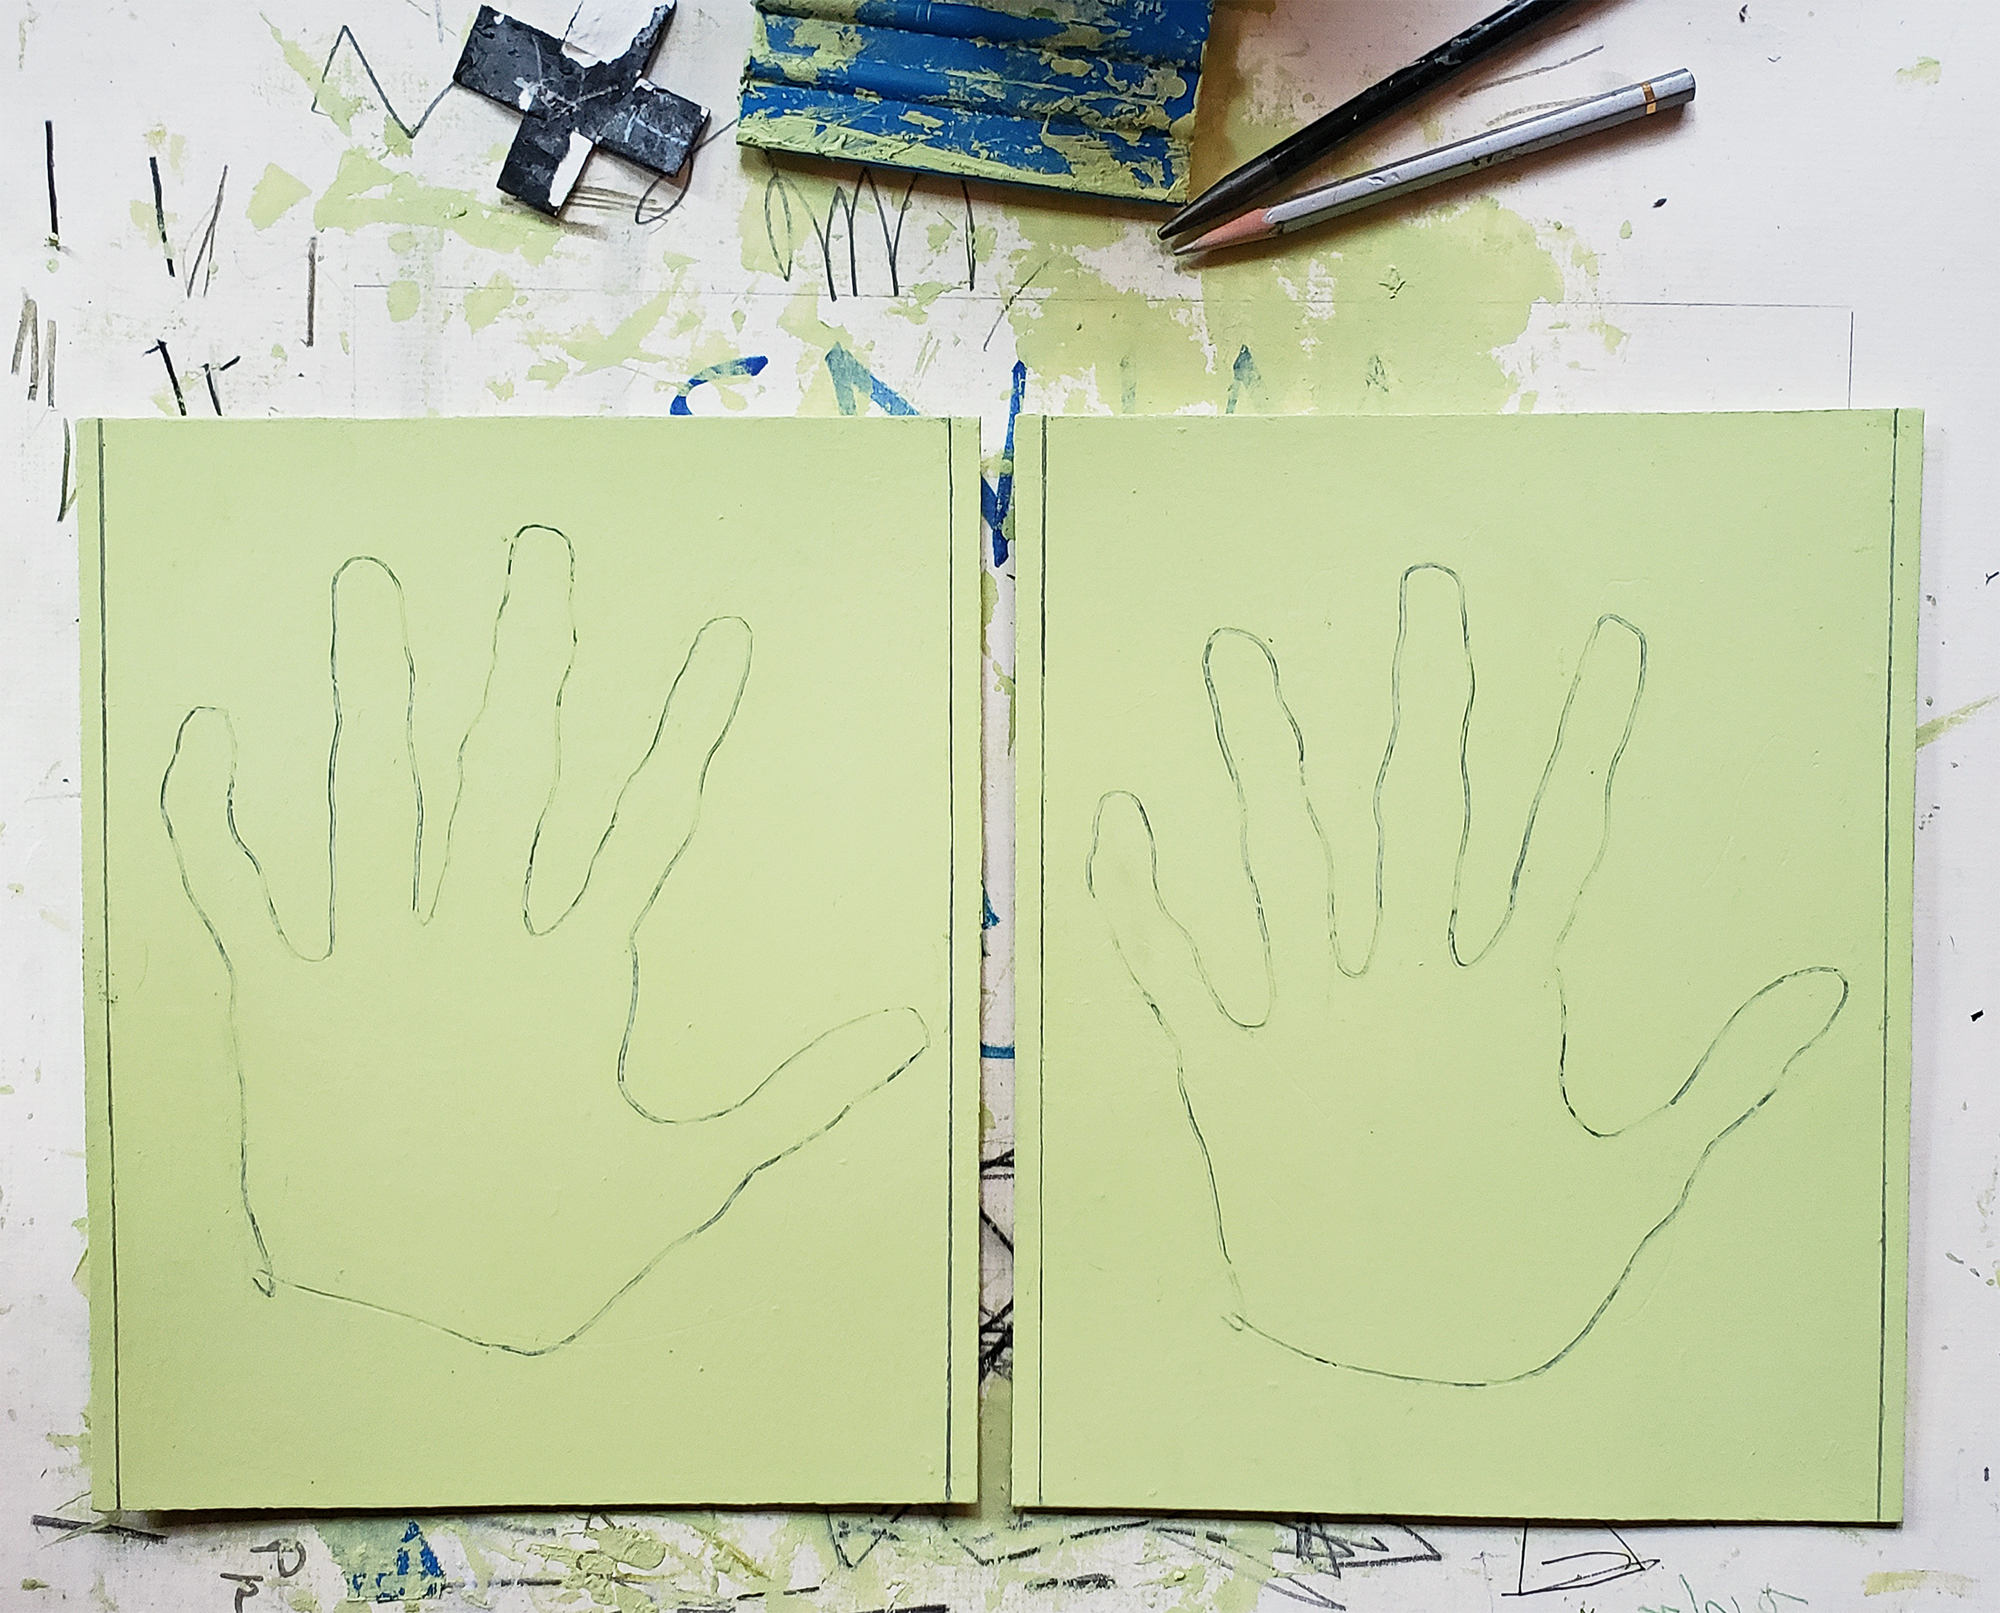 MY_HANDS_10SEPT2021_CATHERINELJOHNSON